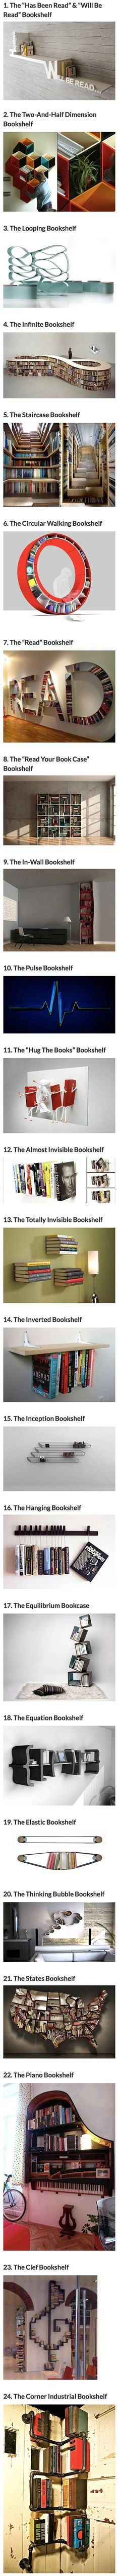 Cool and creative bookshelves - Imgur